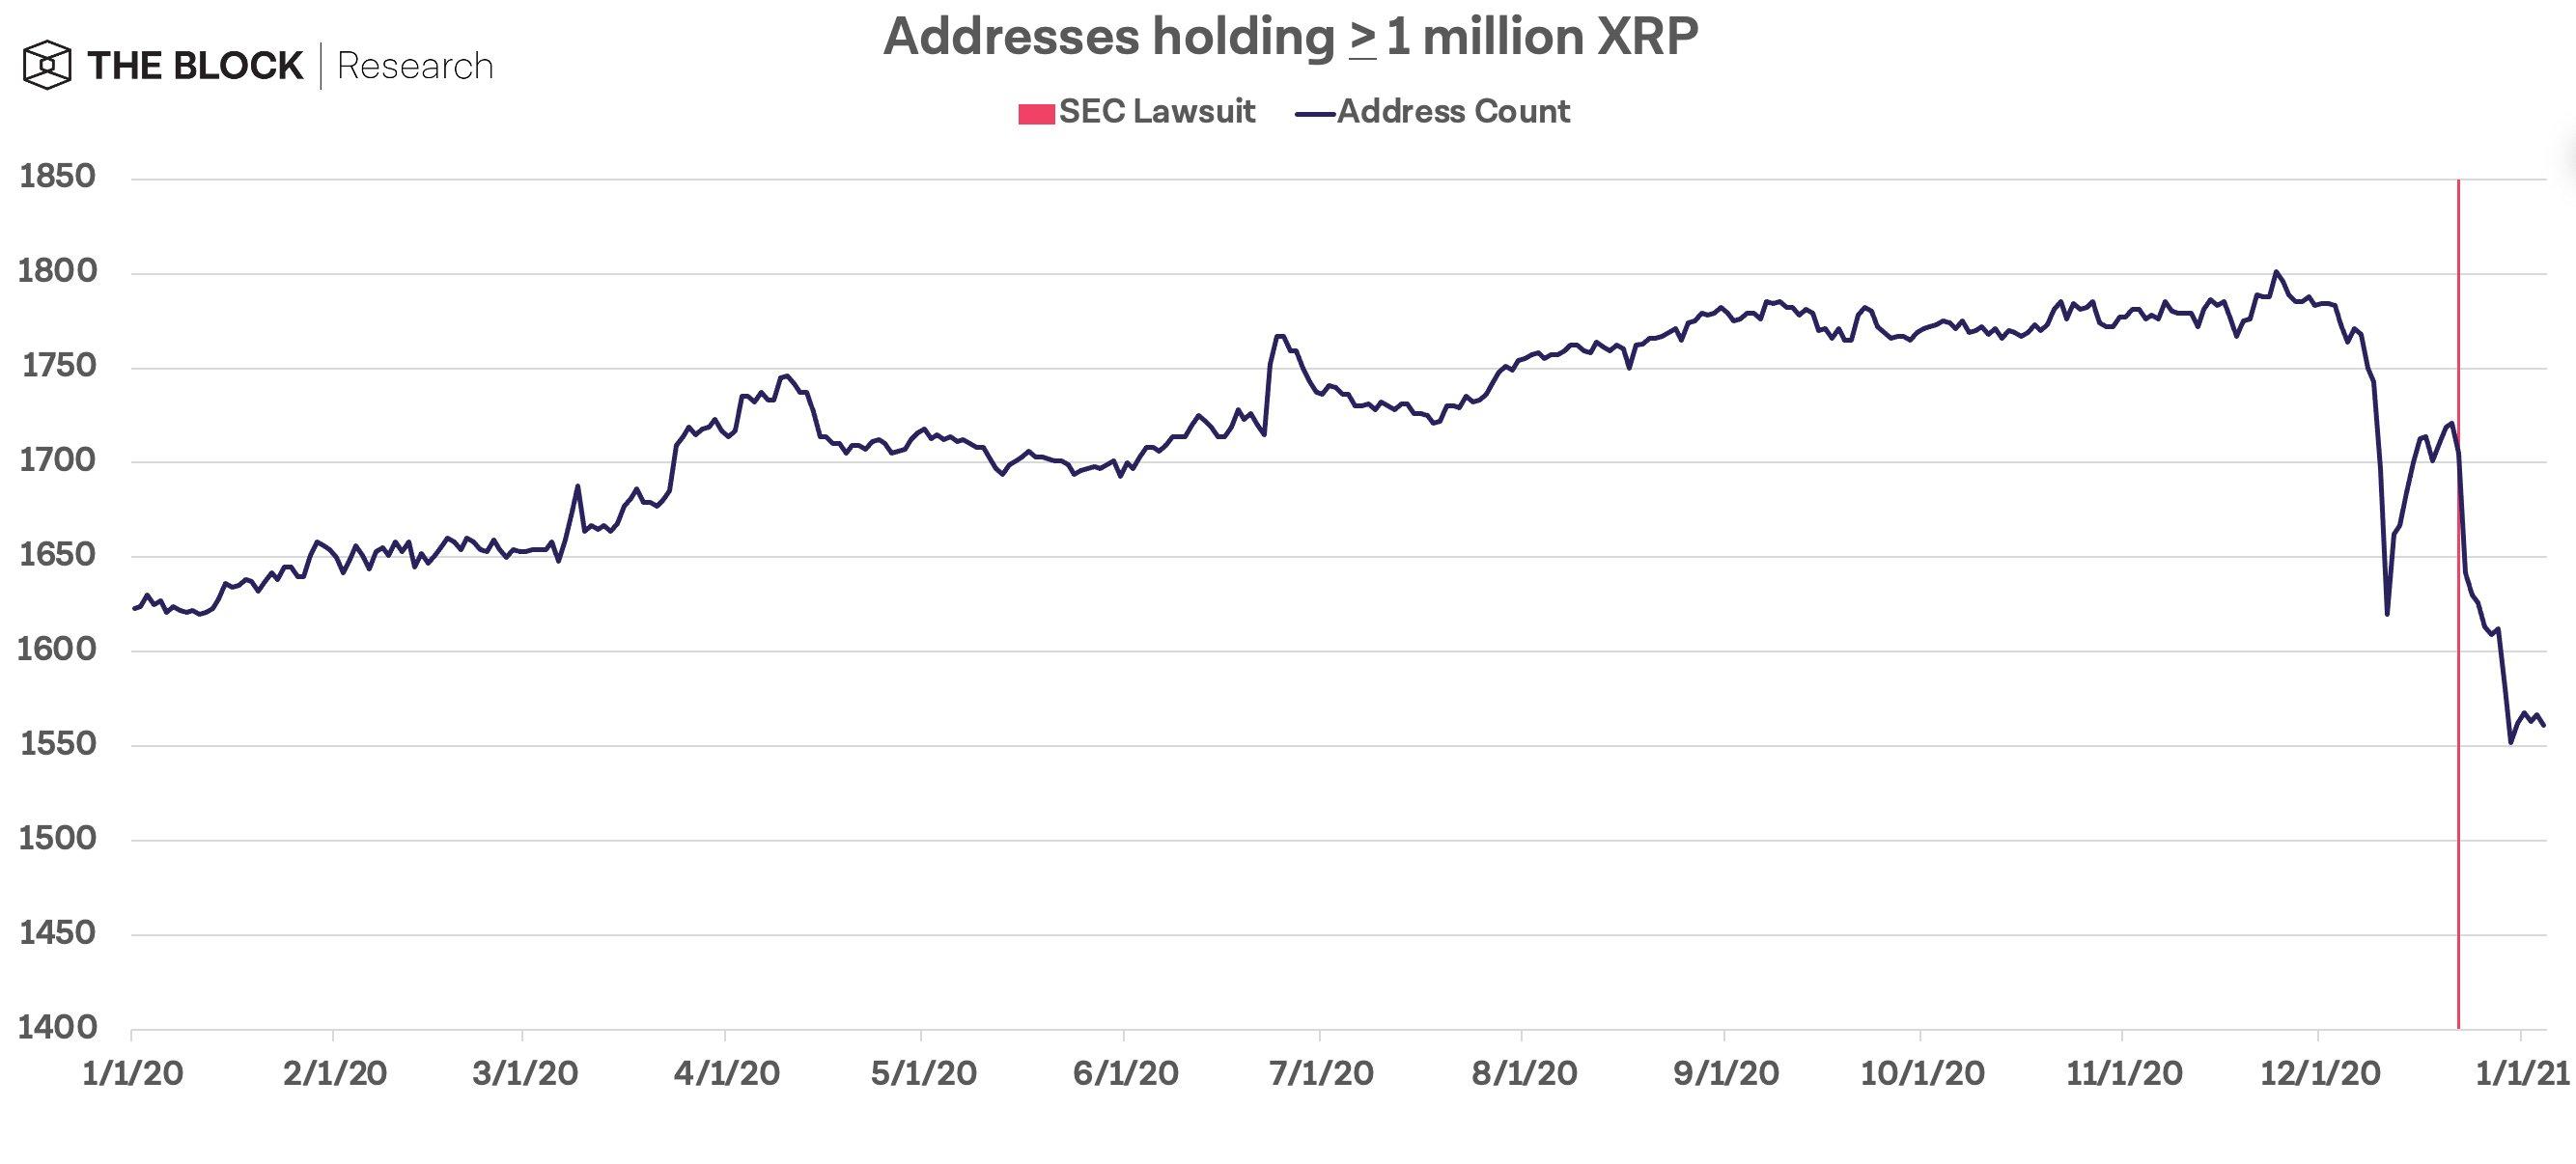 За 2020 год Джед Маккалеб успел продать свыше 1 млрд XRP